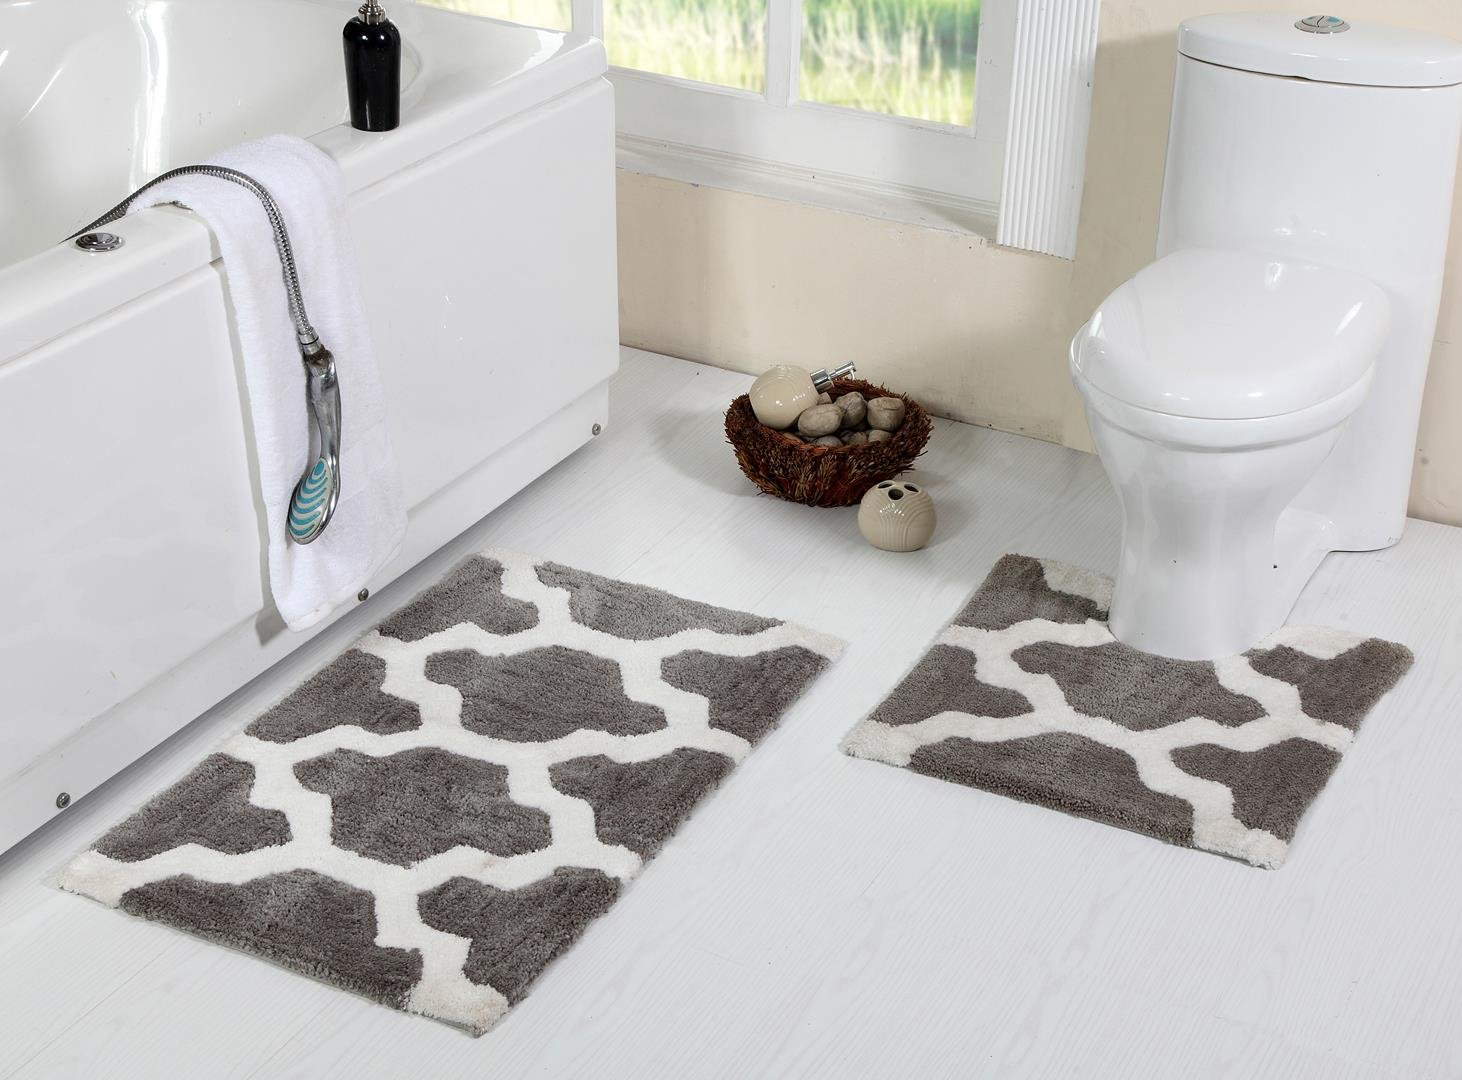 WARISI - Pedestal Collection - 2 Piece Designer Plush Quaterfoil Lattice Pattern Bath Rug + Contour (Toilet seat Foot Rug) (34''x21'', Grey)